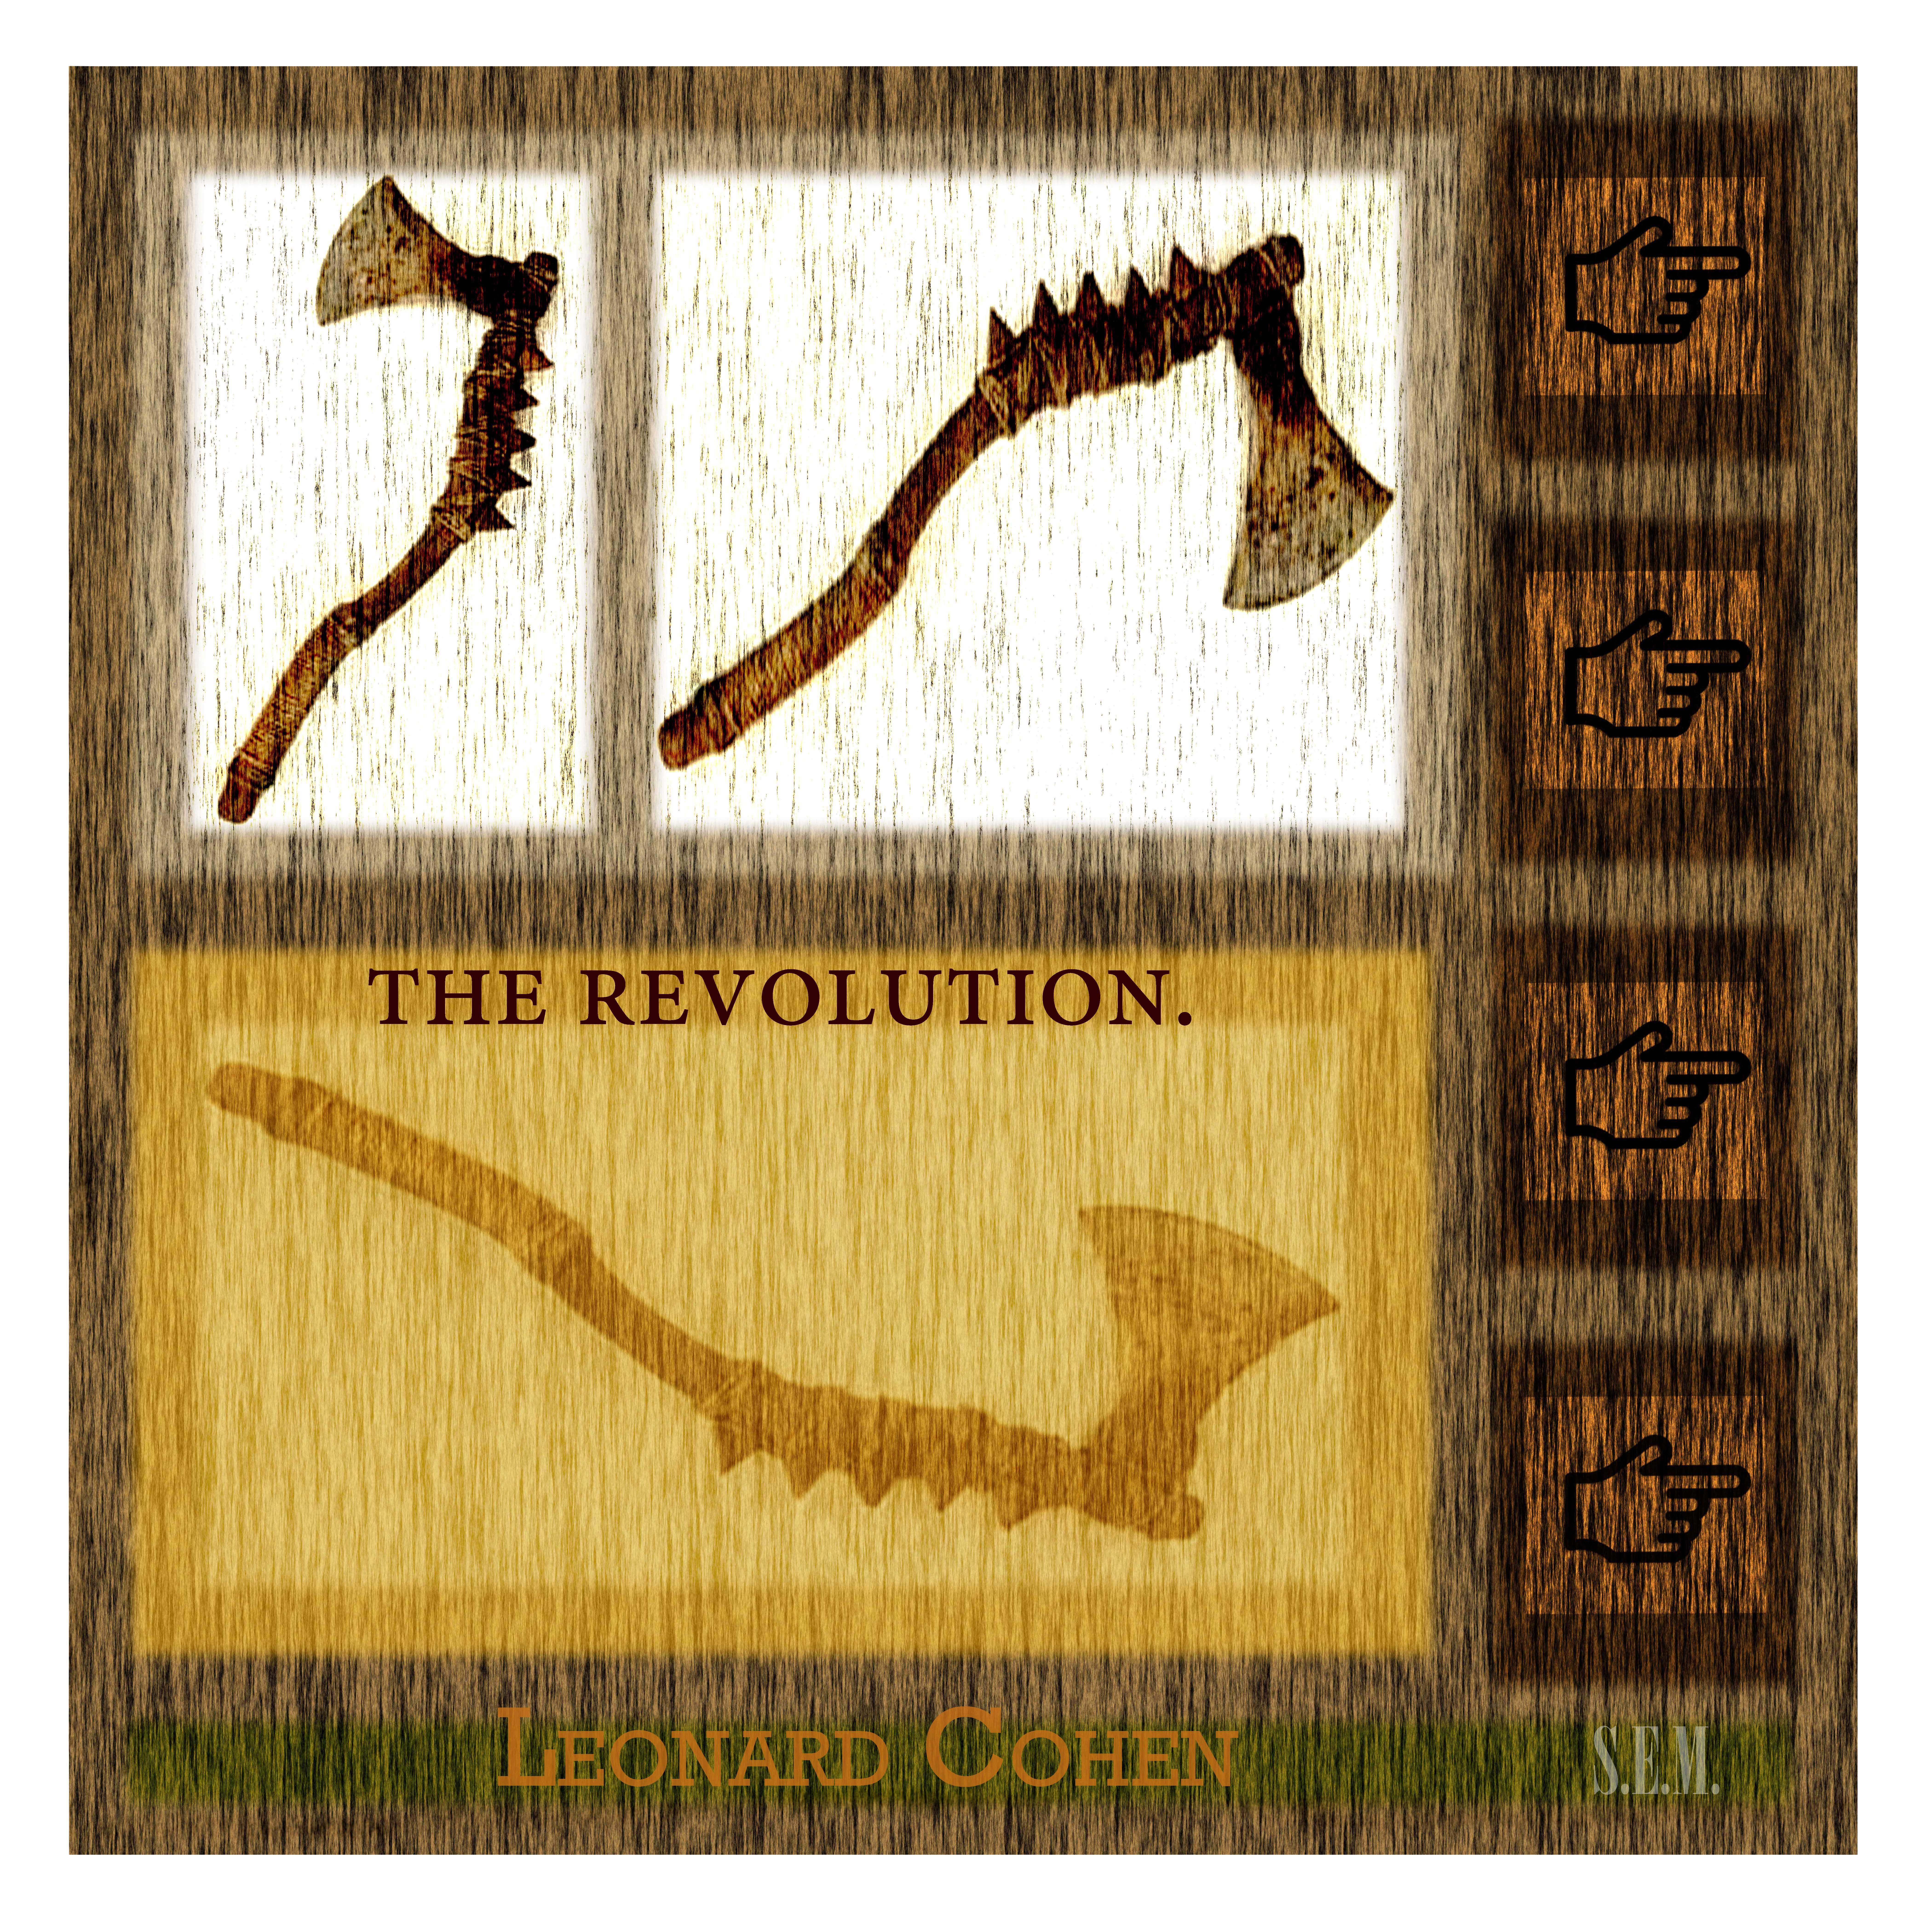 4therevolution